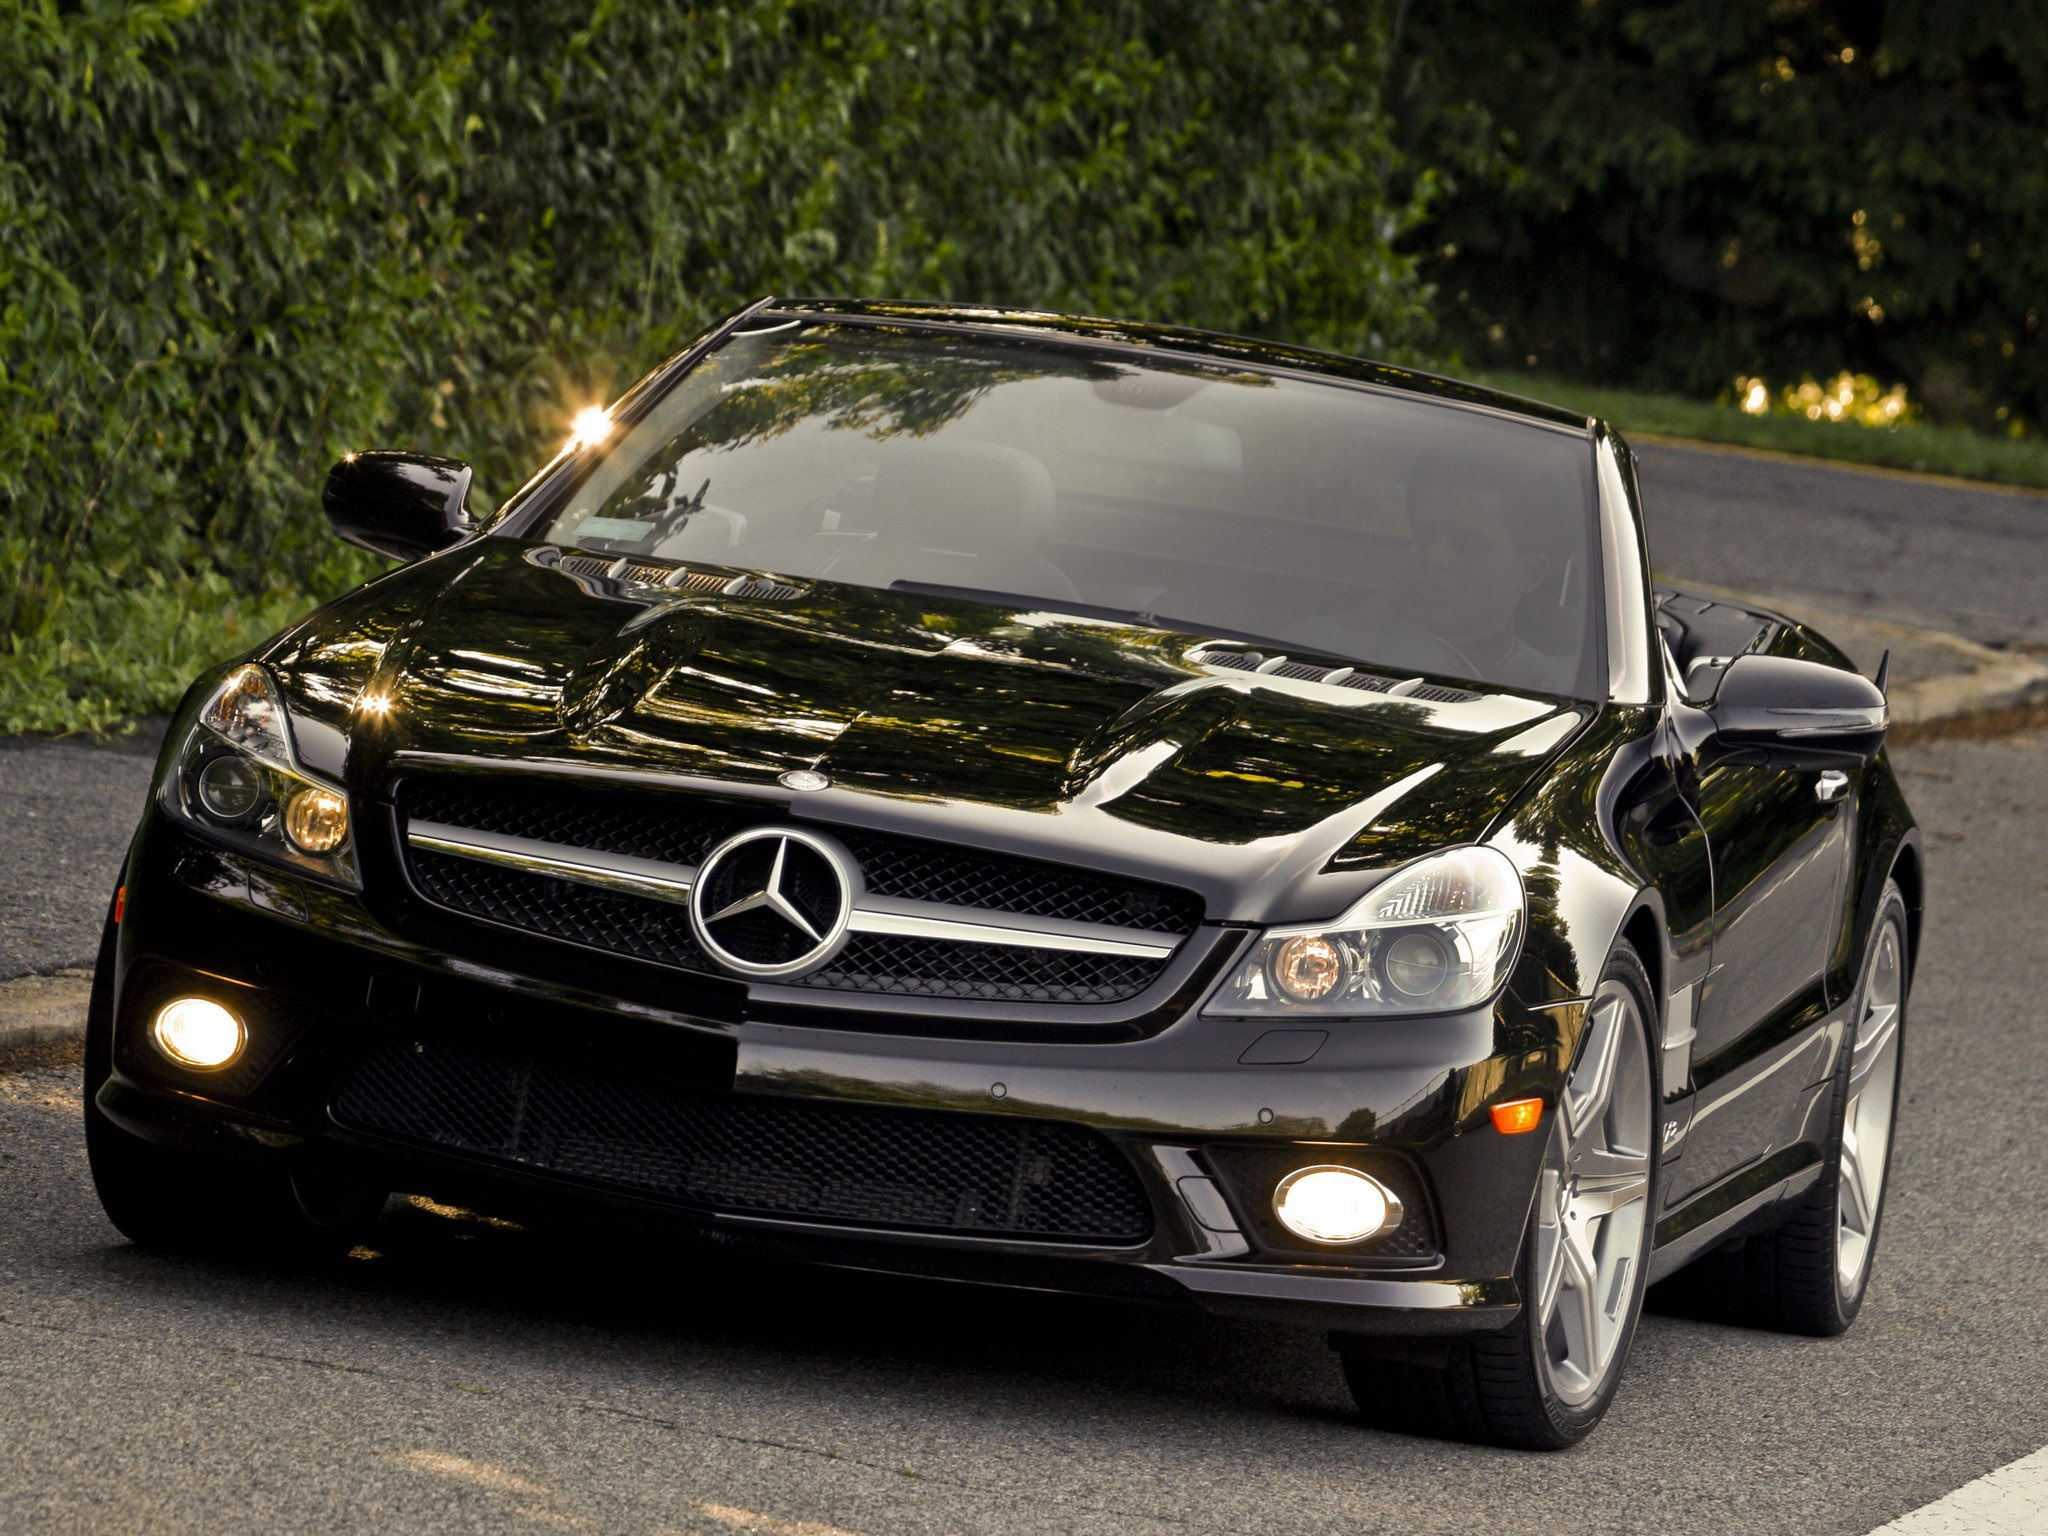 Mercedes sl klasse 600 r230 usa 2008 mercedes sl klasse for 2008 mercedes benz sl500